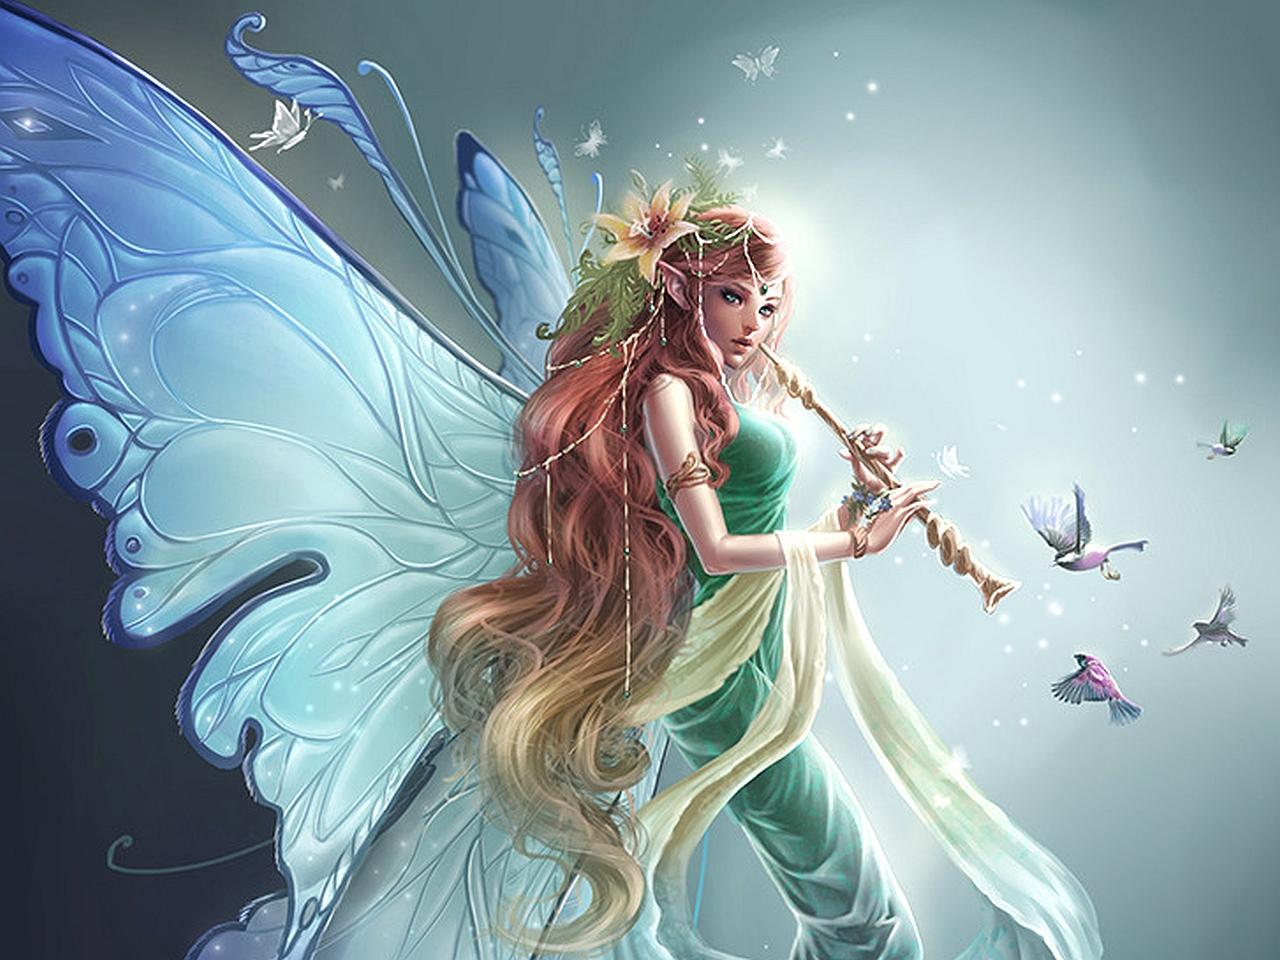 Gothic Fairy Desktop Wallpaper 1280x960